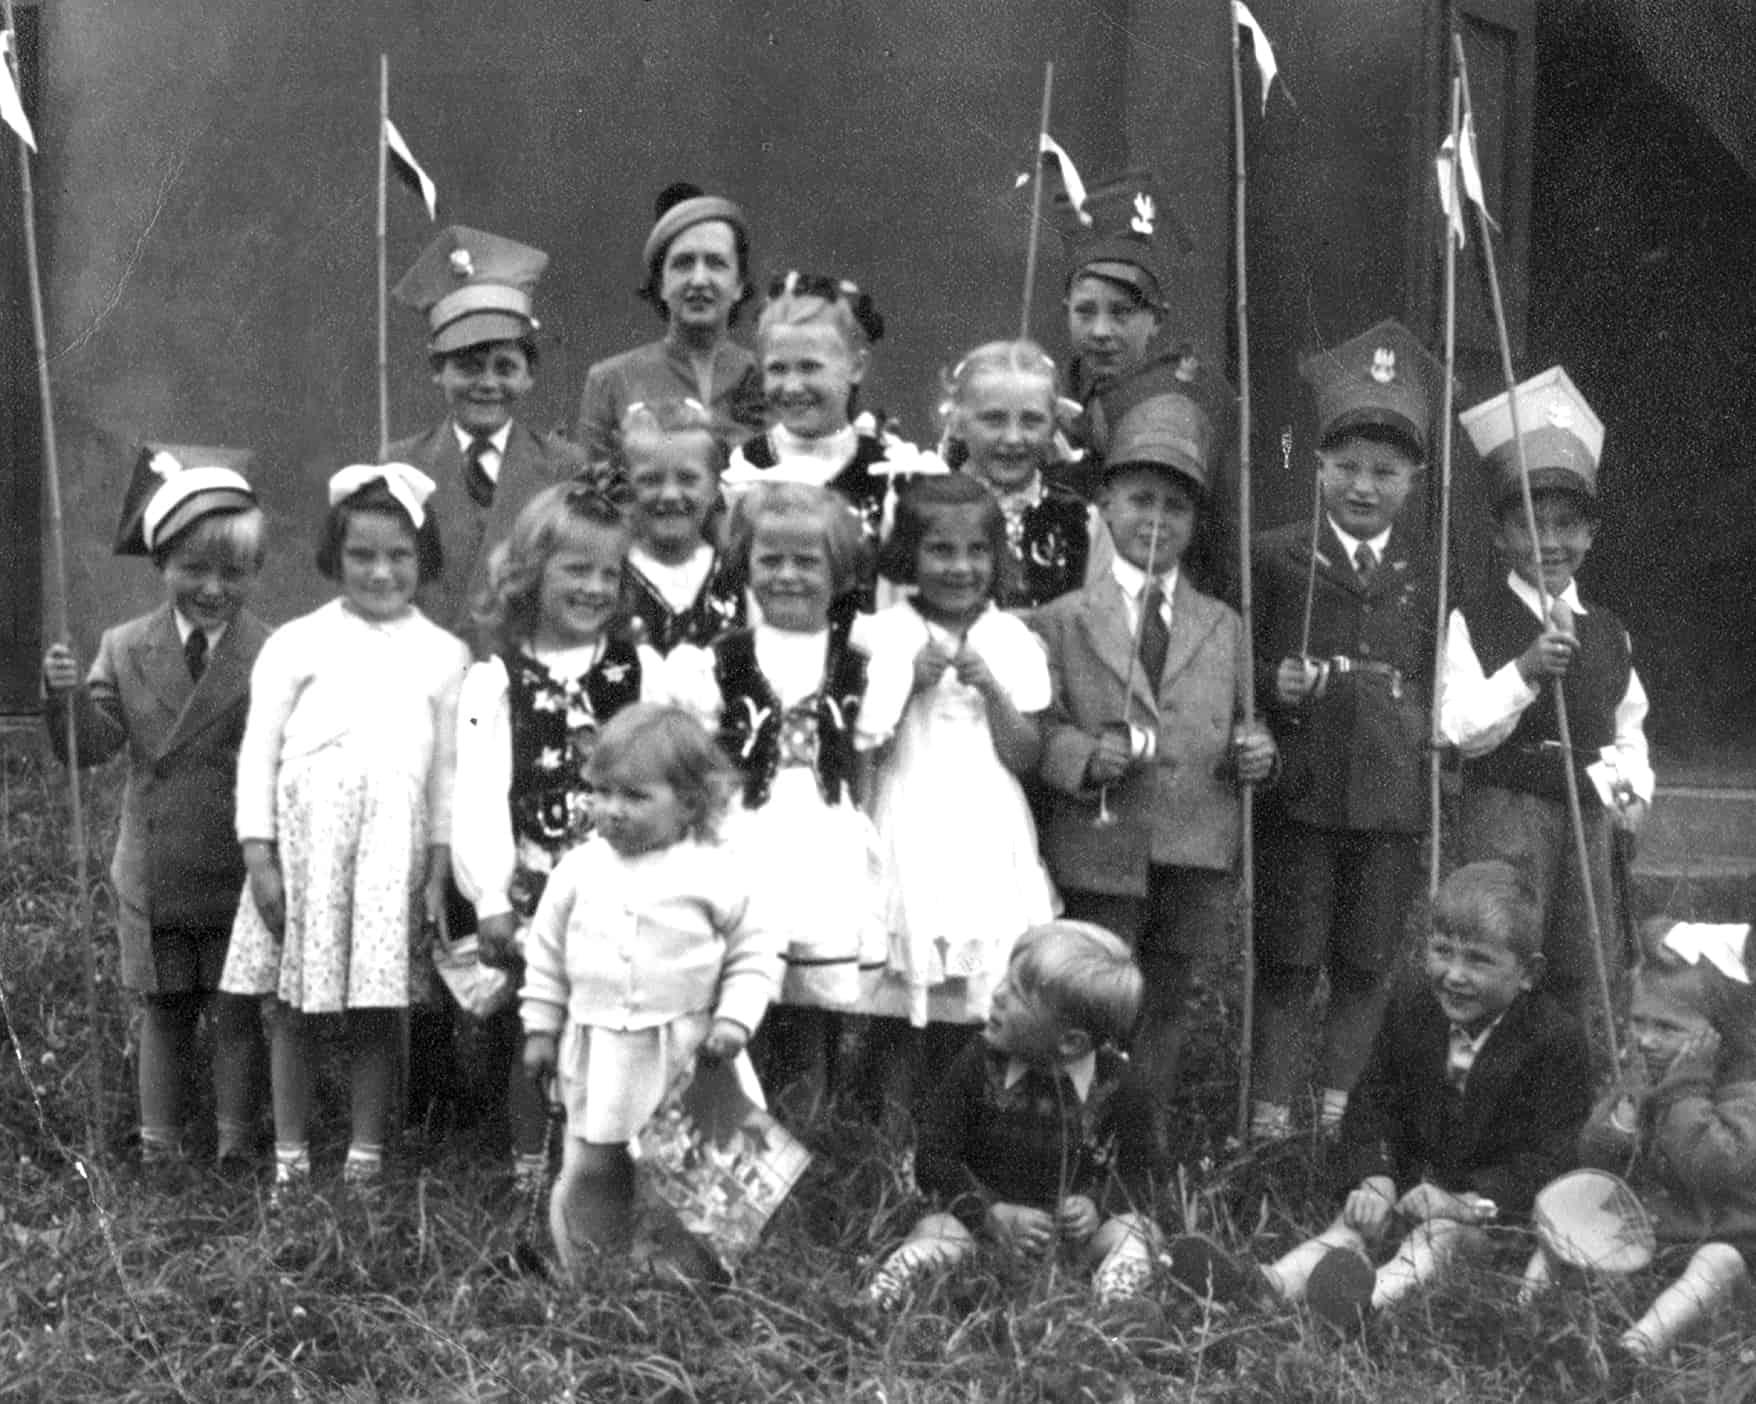 Polish School, Wrottesley Park, early 1950s.